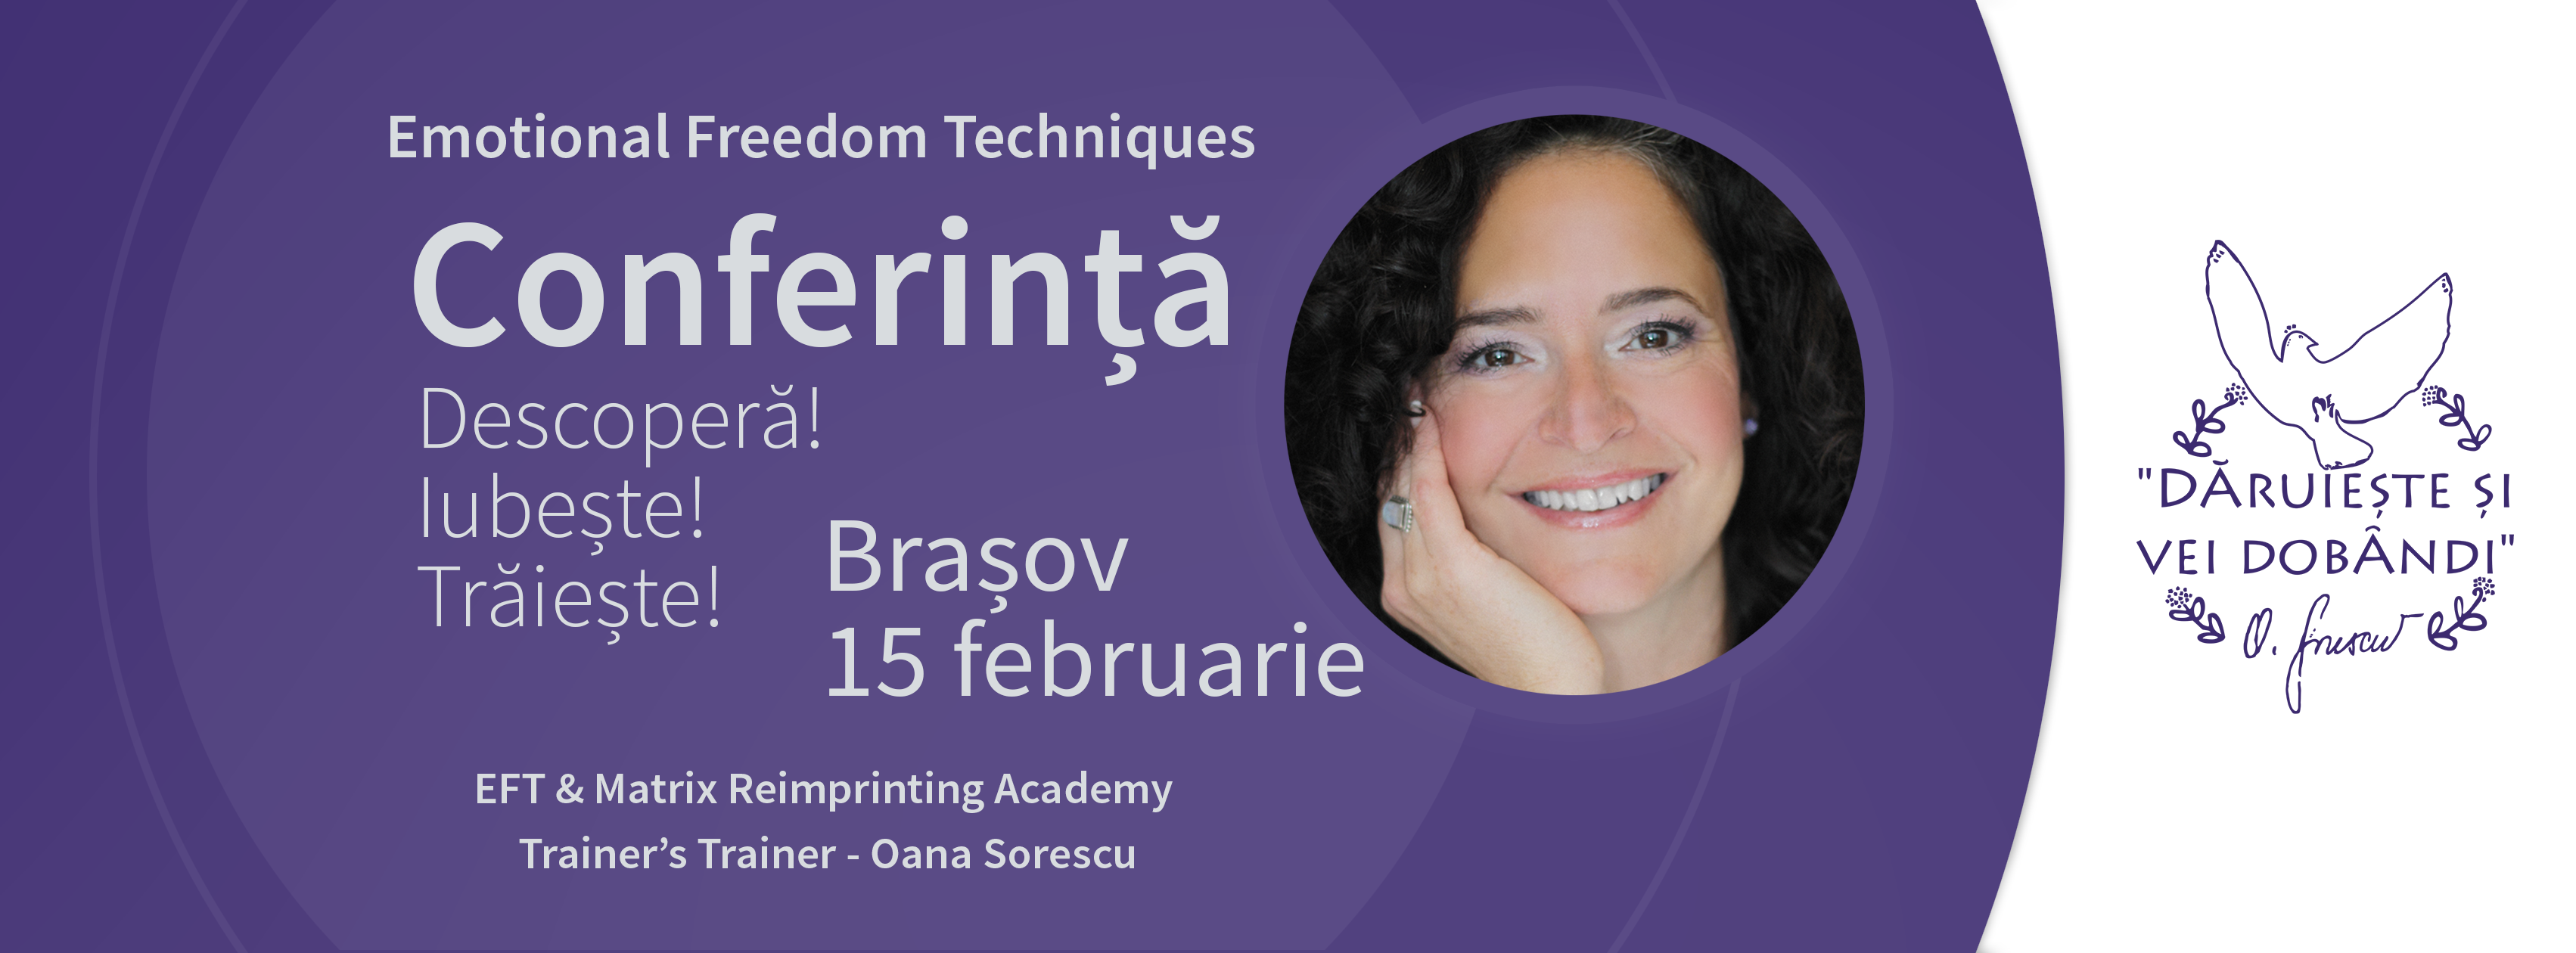 15_februarie_brasov_conferinta